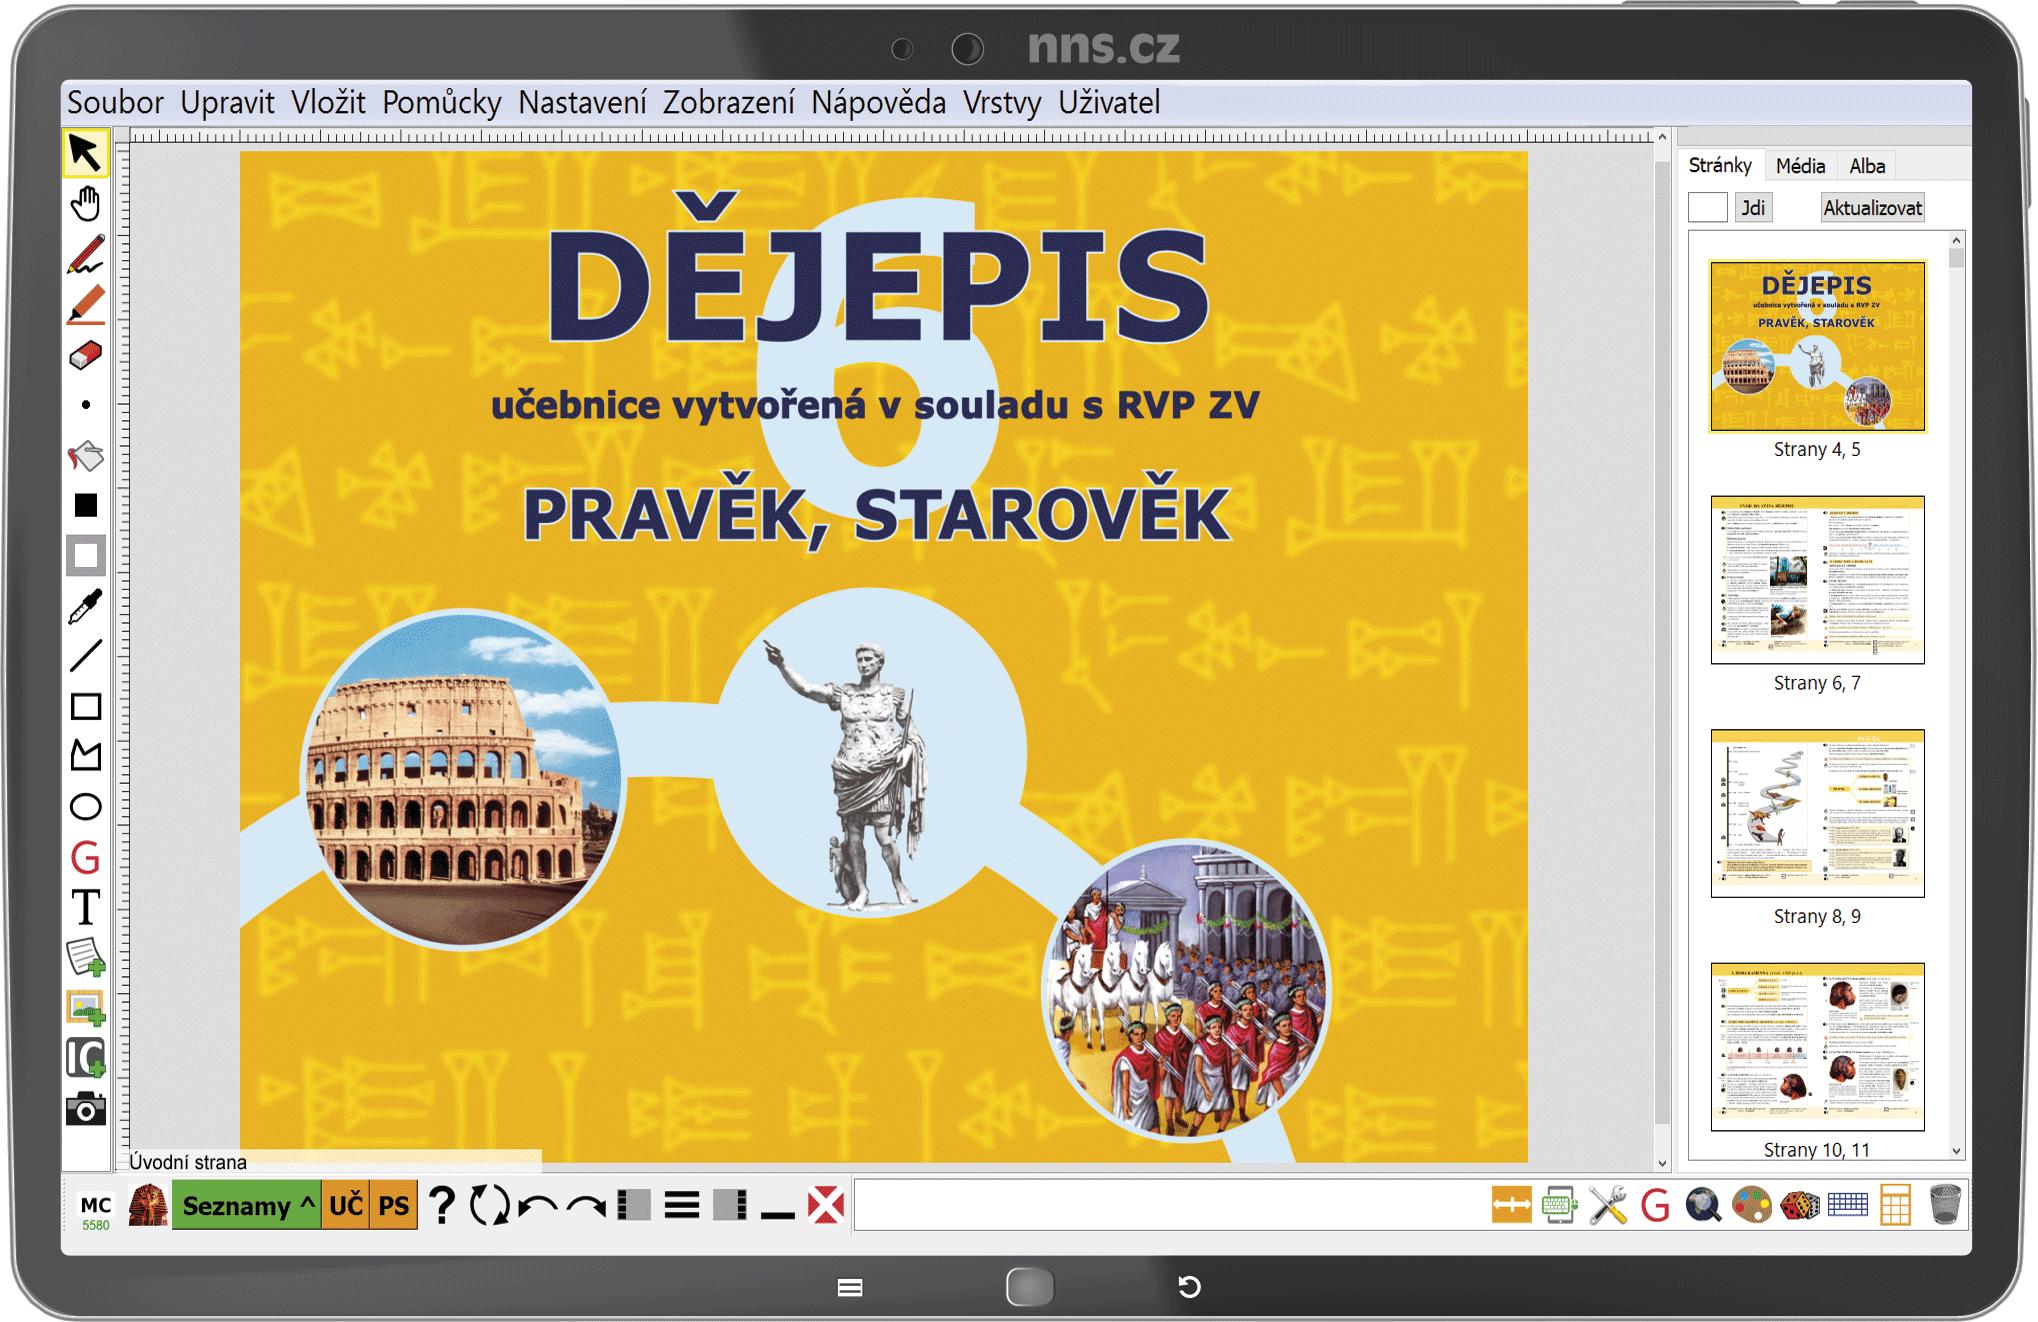 MIUč+ Dějepis 6 - Pravěk a starověk - šk. multilicence na 1 šk. rok